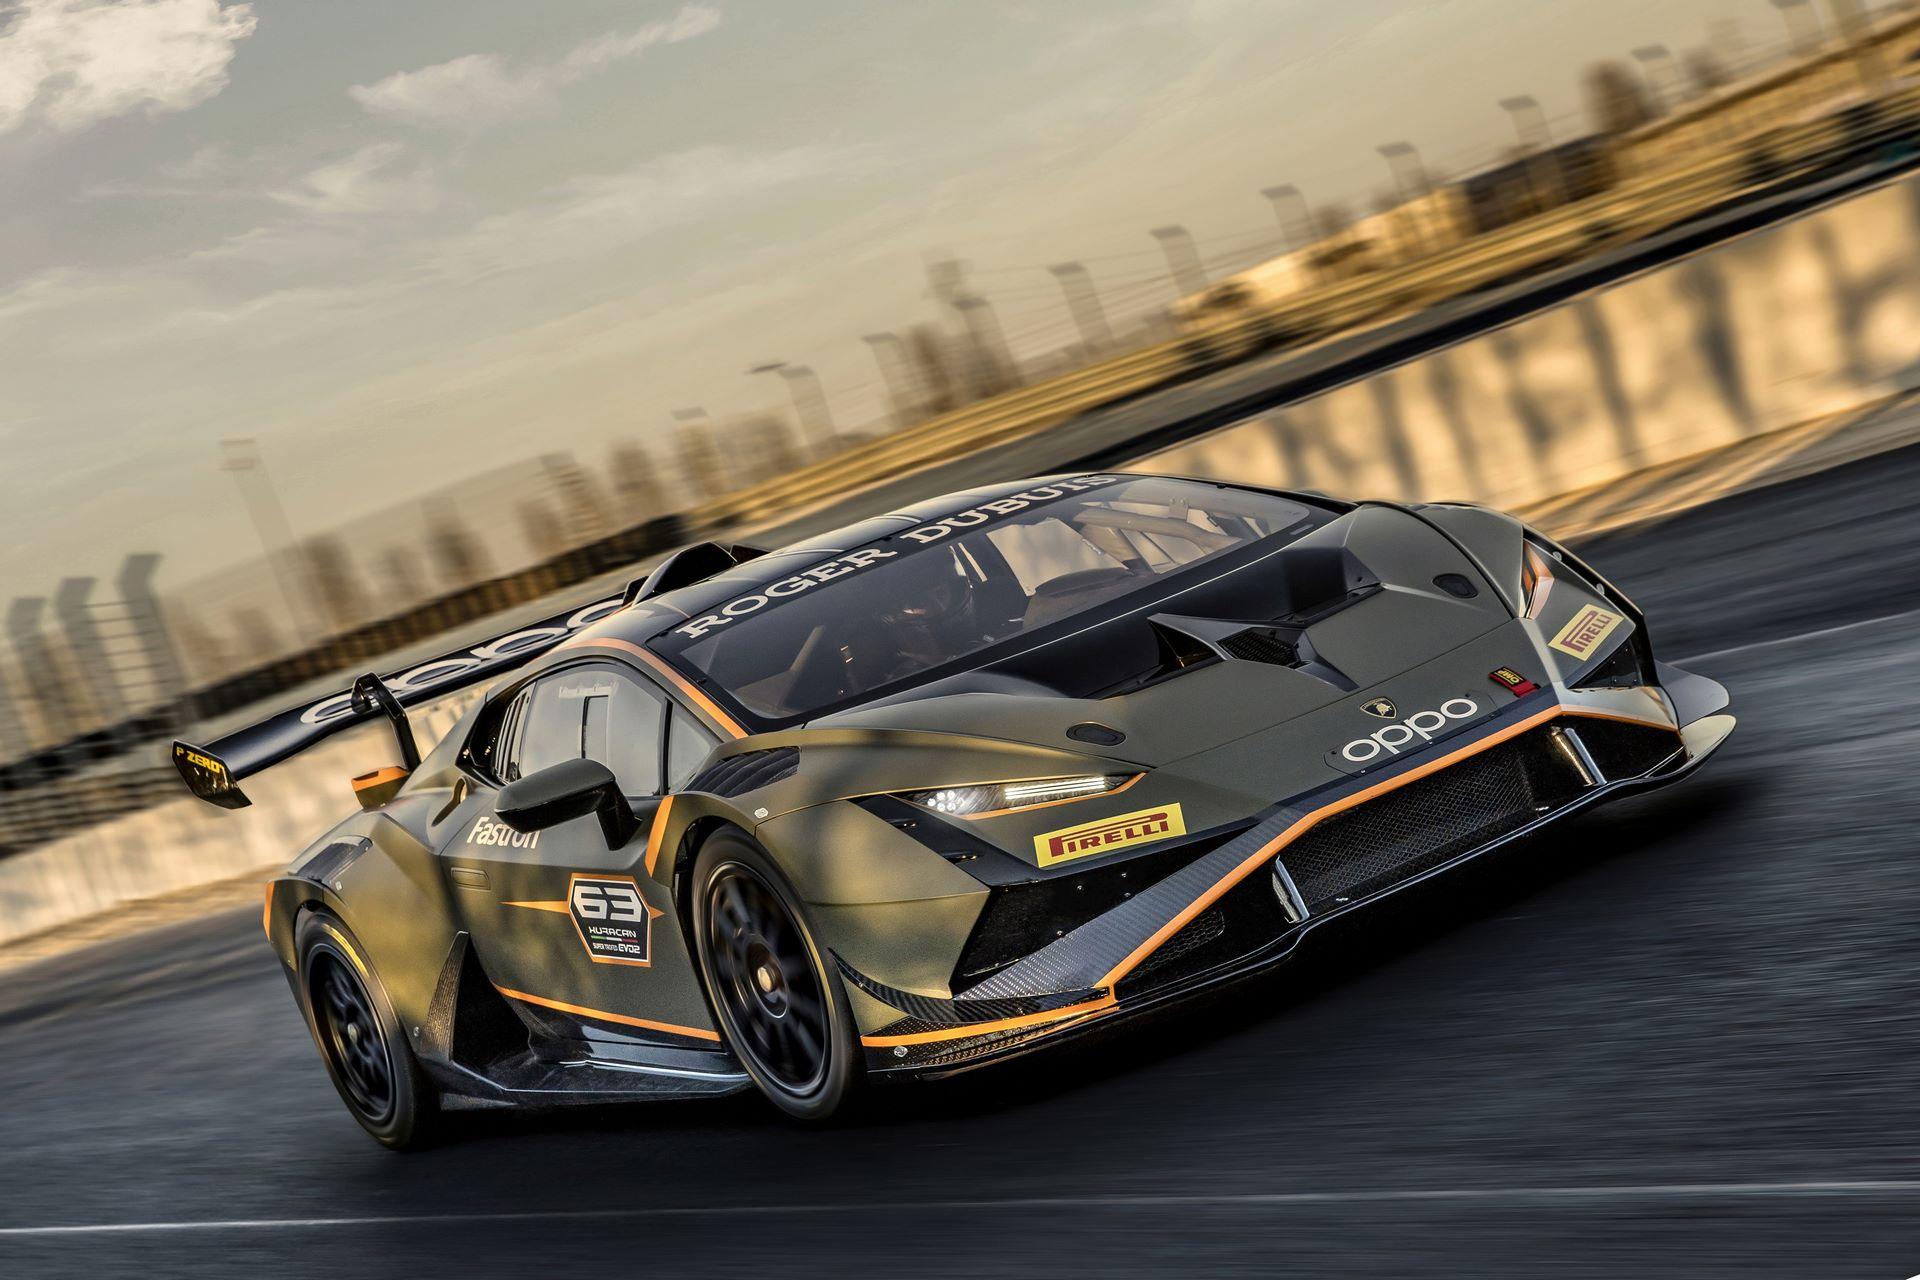 Lamborghini-Huracan-Super-Trofeo-EVO2-14